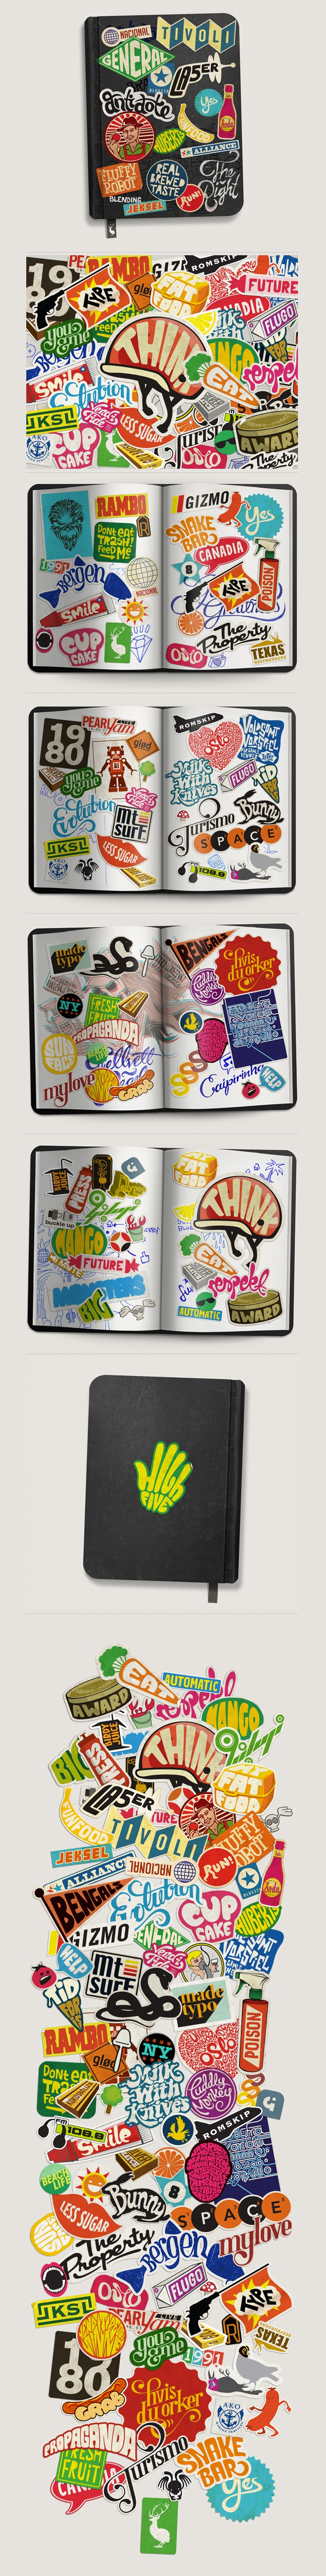 Sticker Typography, Mats Ottdal